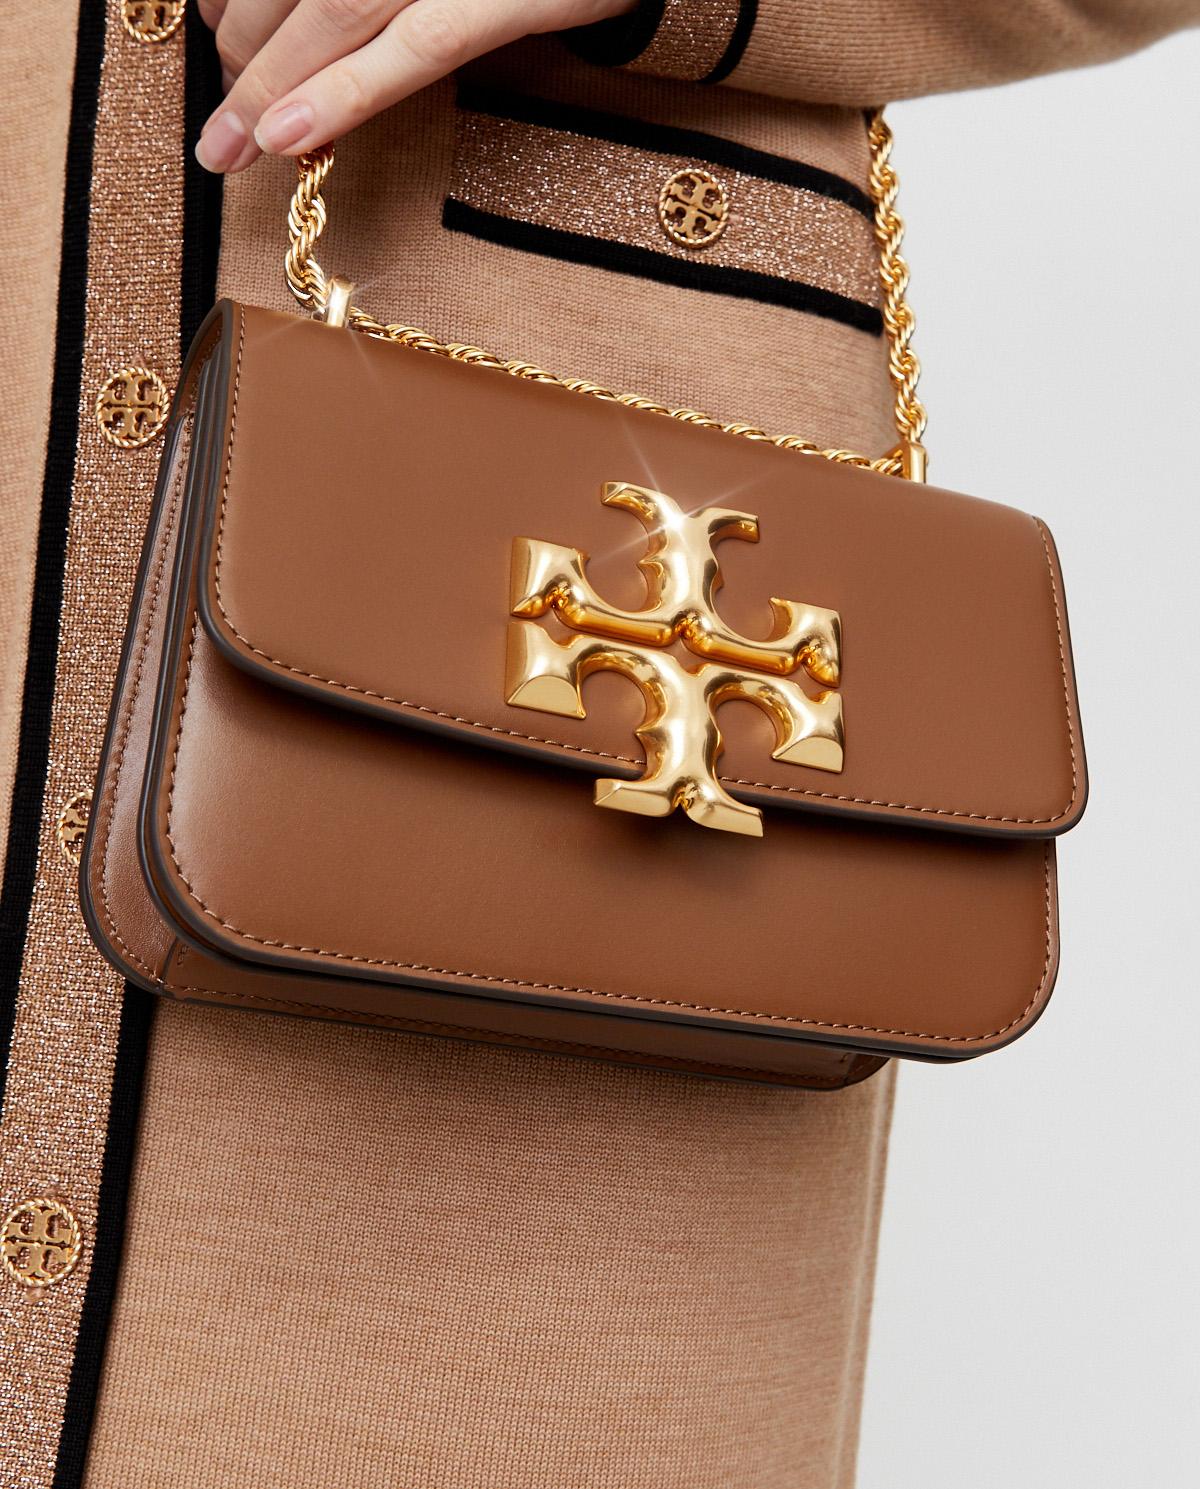 Brązowa torebka na ramię Eleanor Tory Burch 73589 909